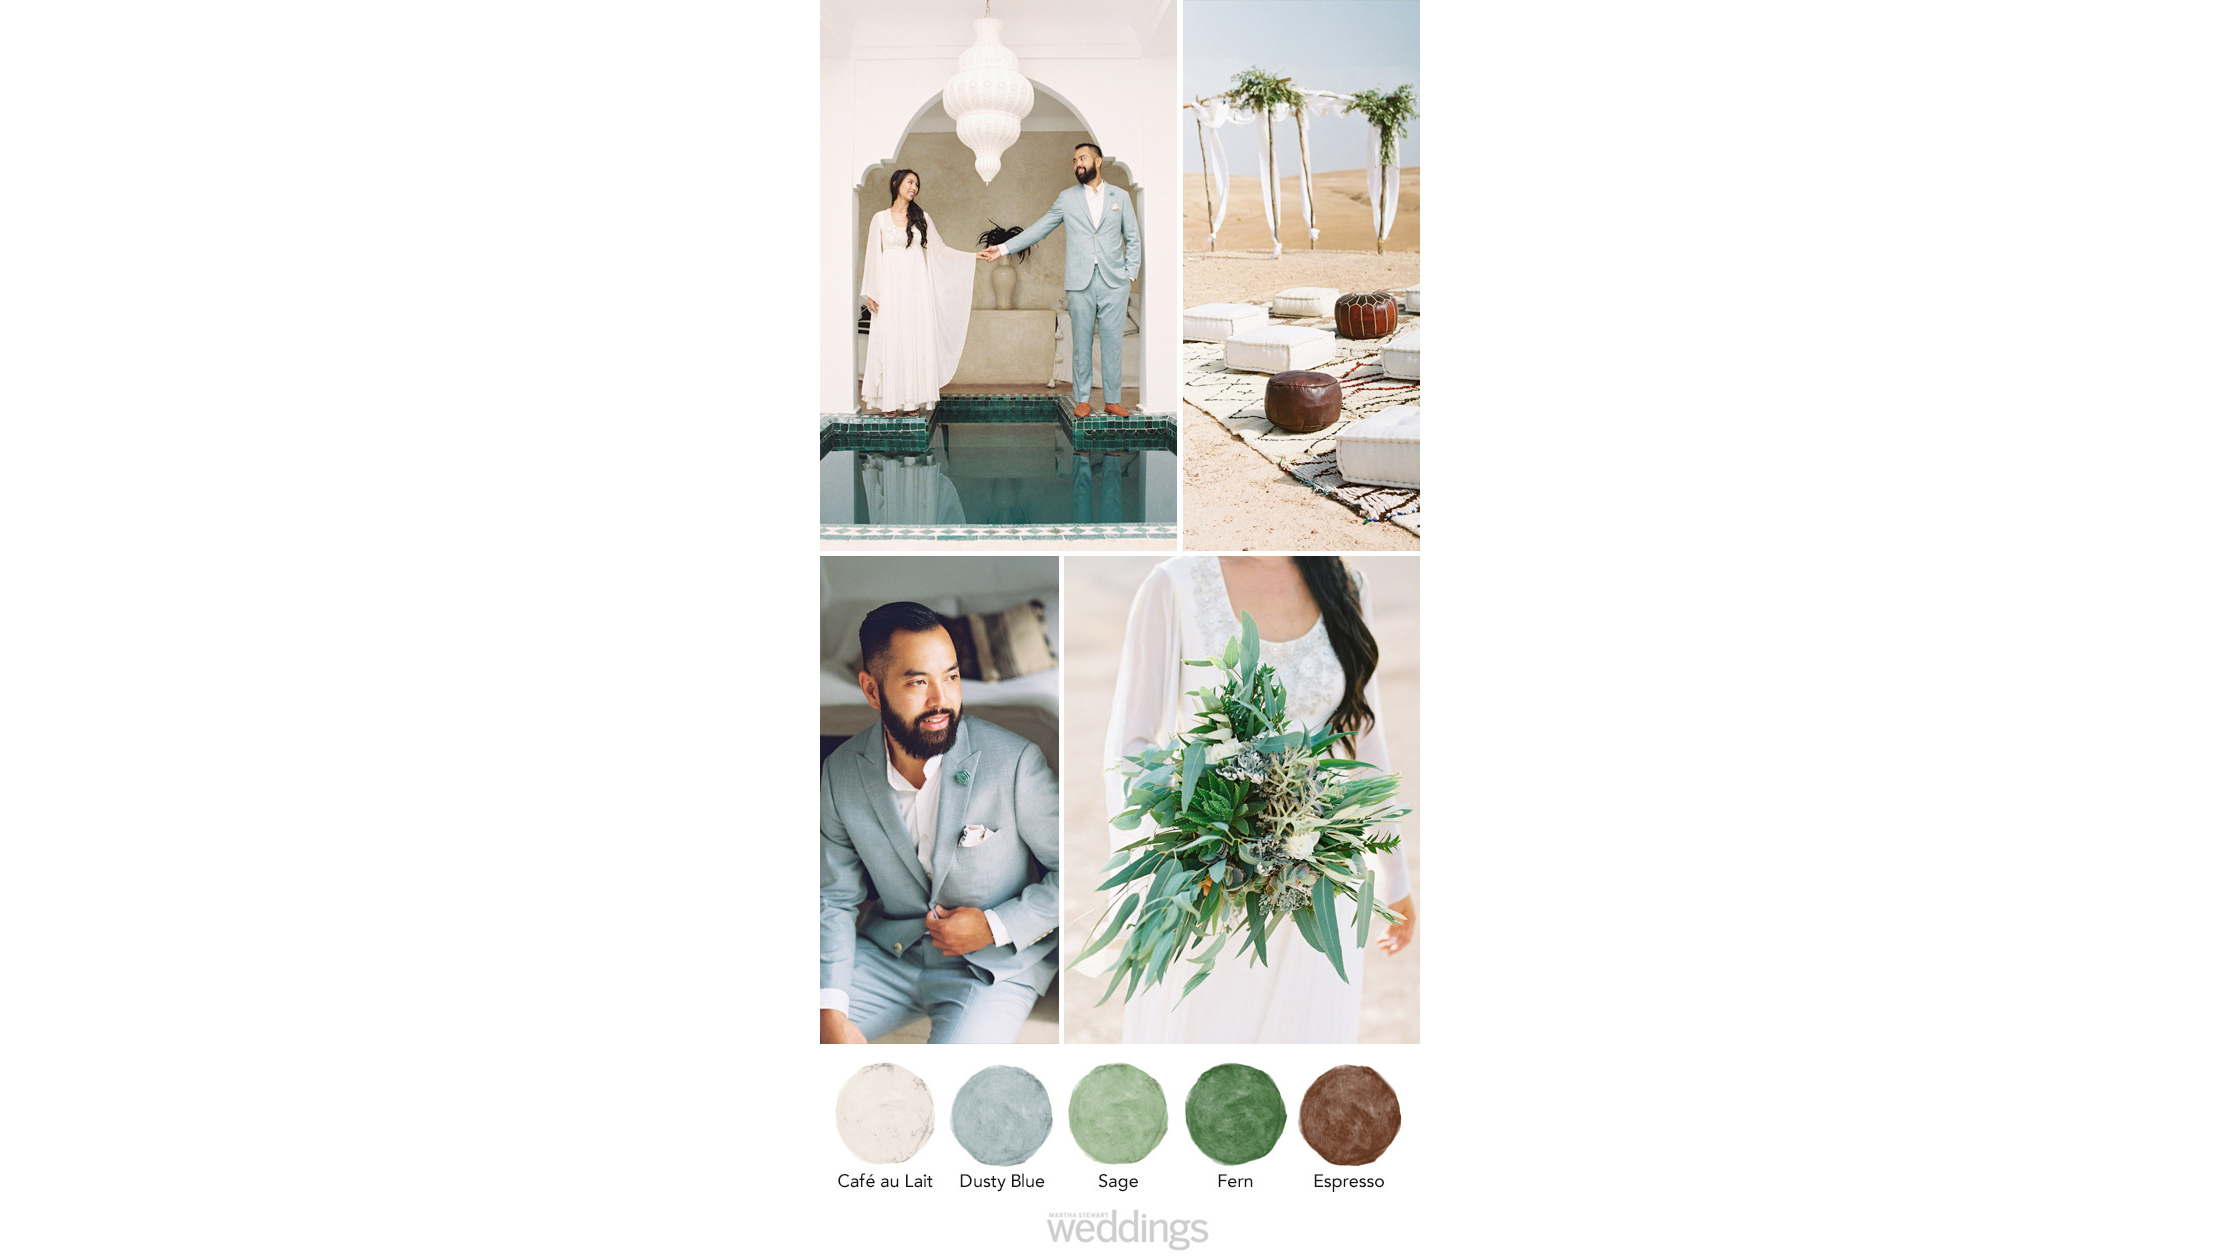 dessert hues wedding color palette ideas